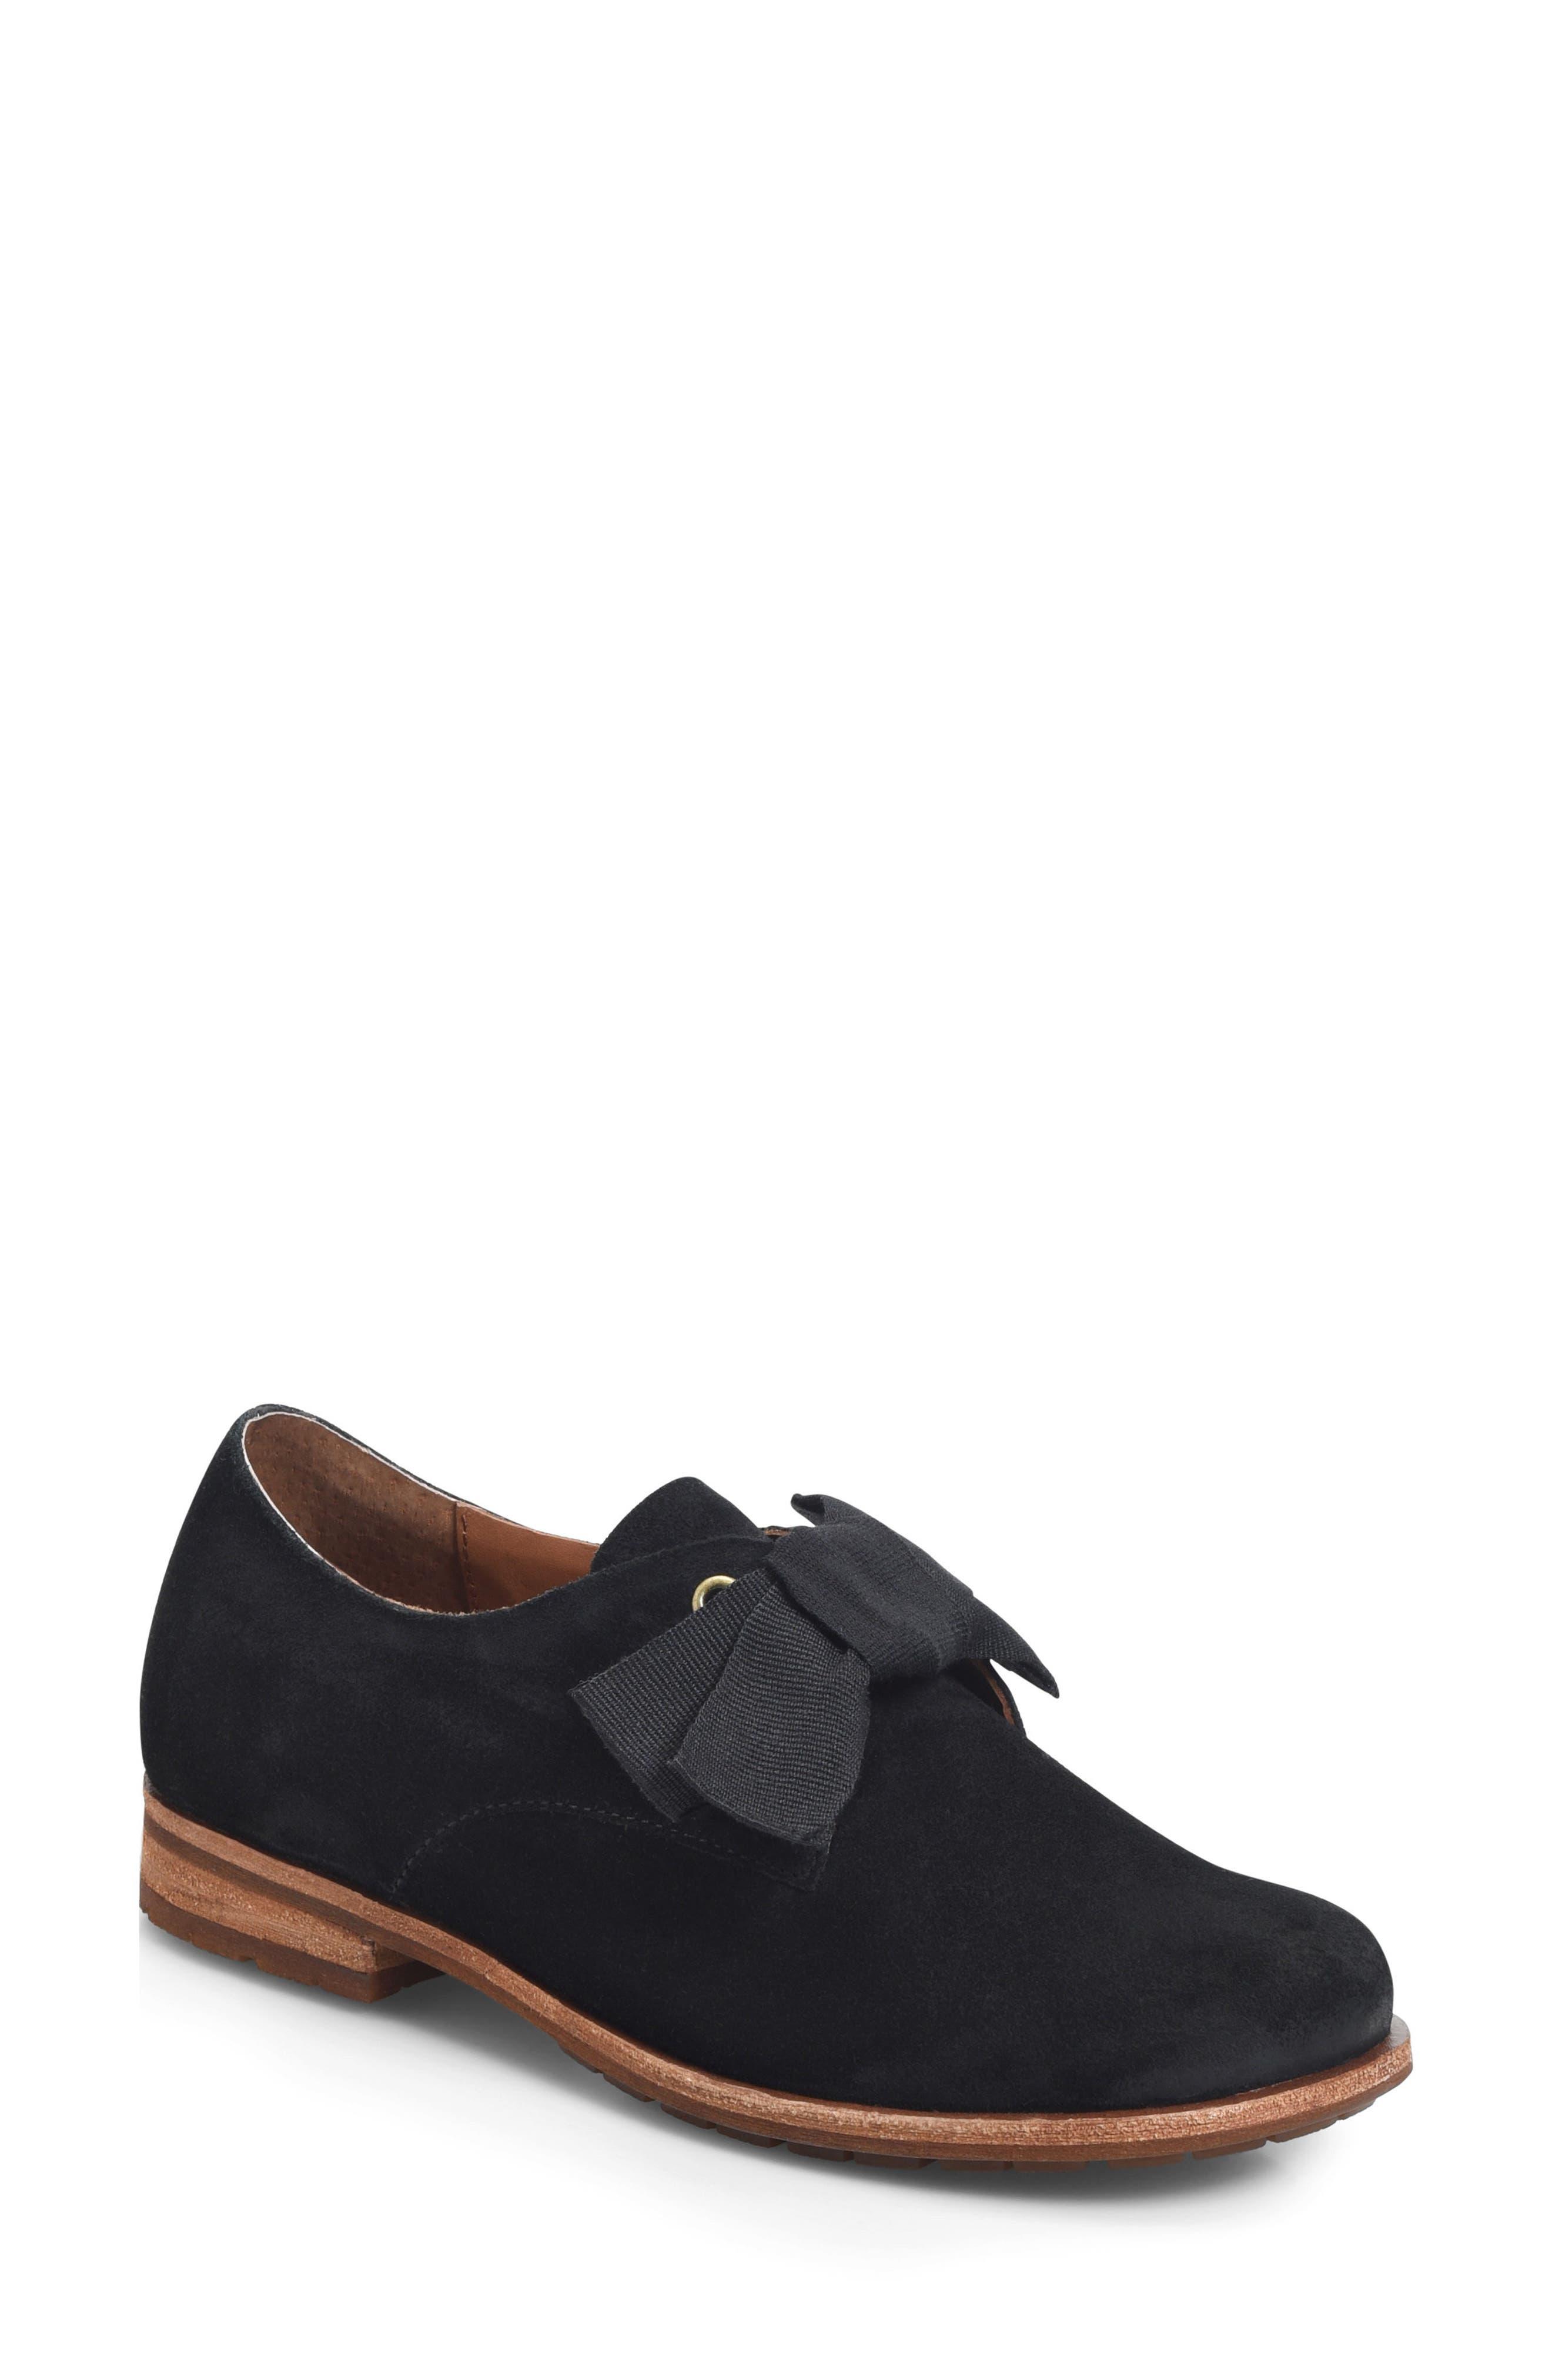 Beryl Bow Flat,                             Main thumbnail 1, color,                             BLACK SUEDE